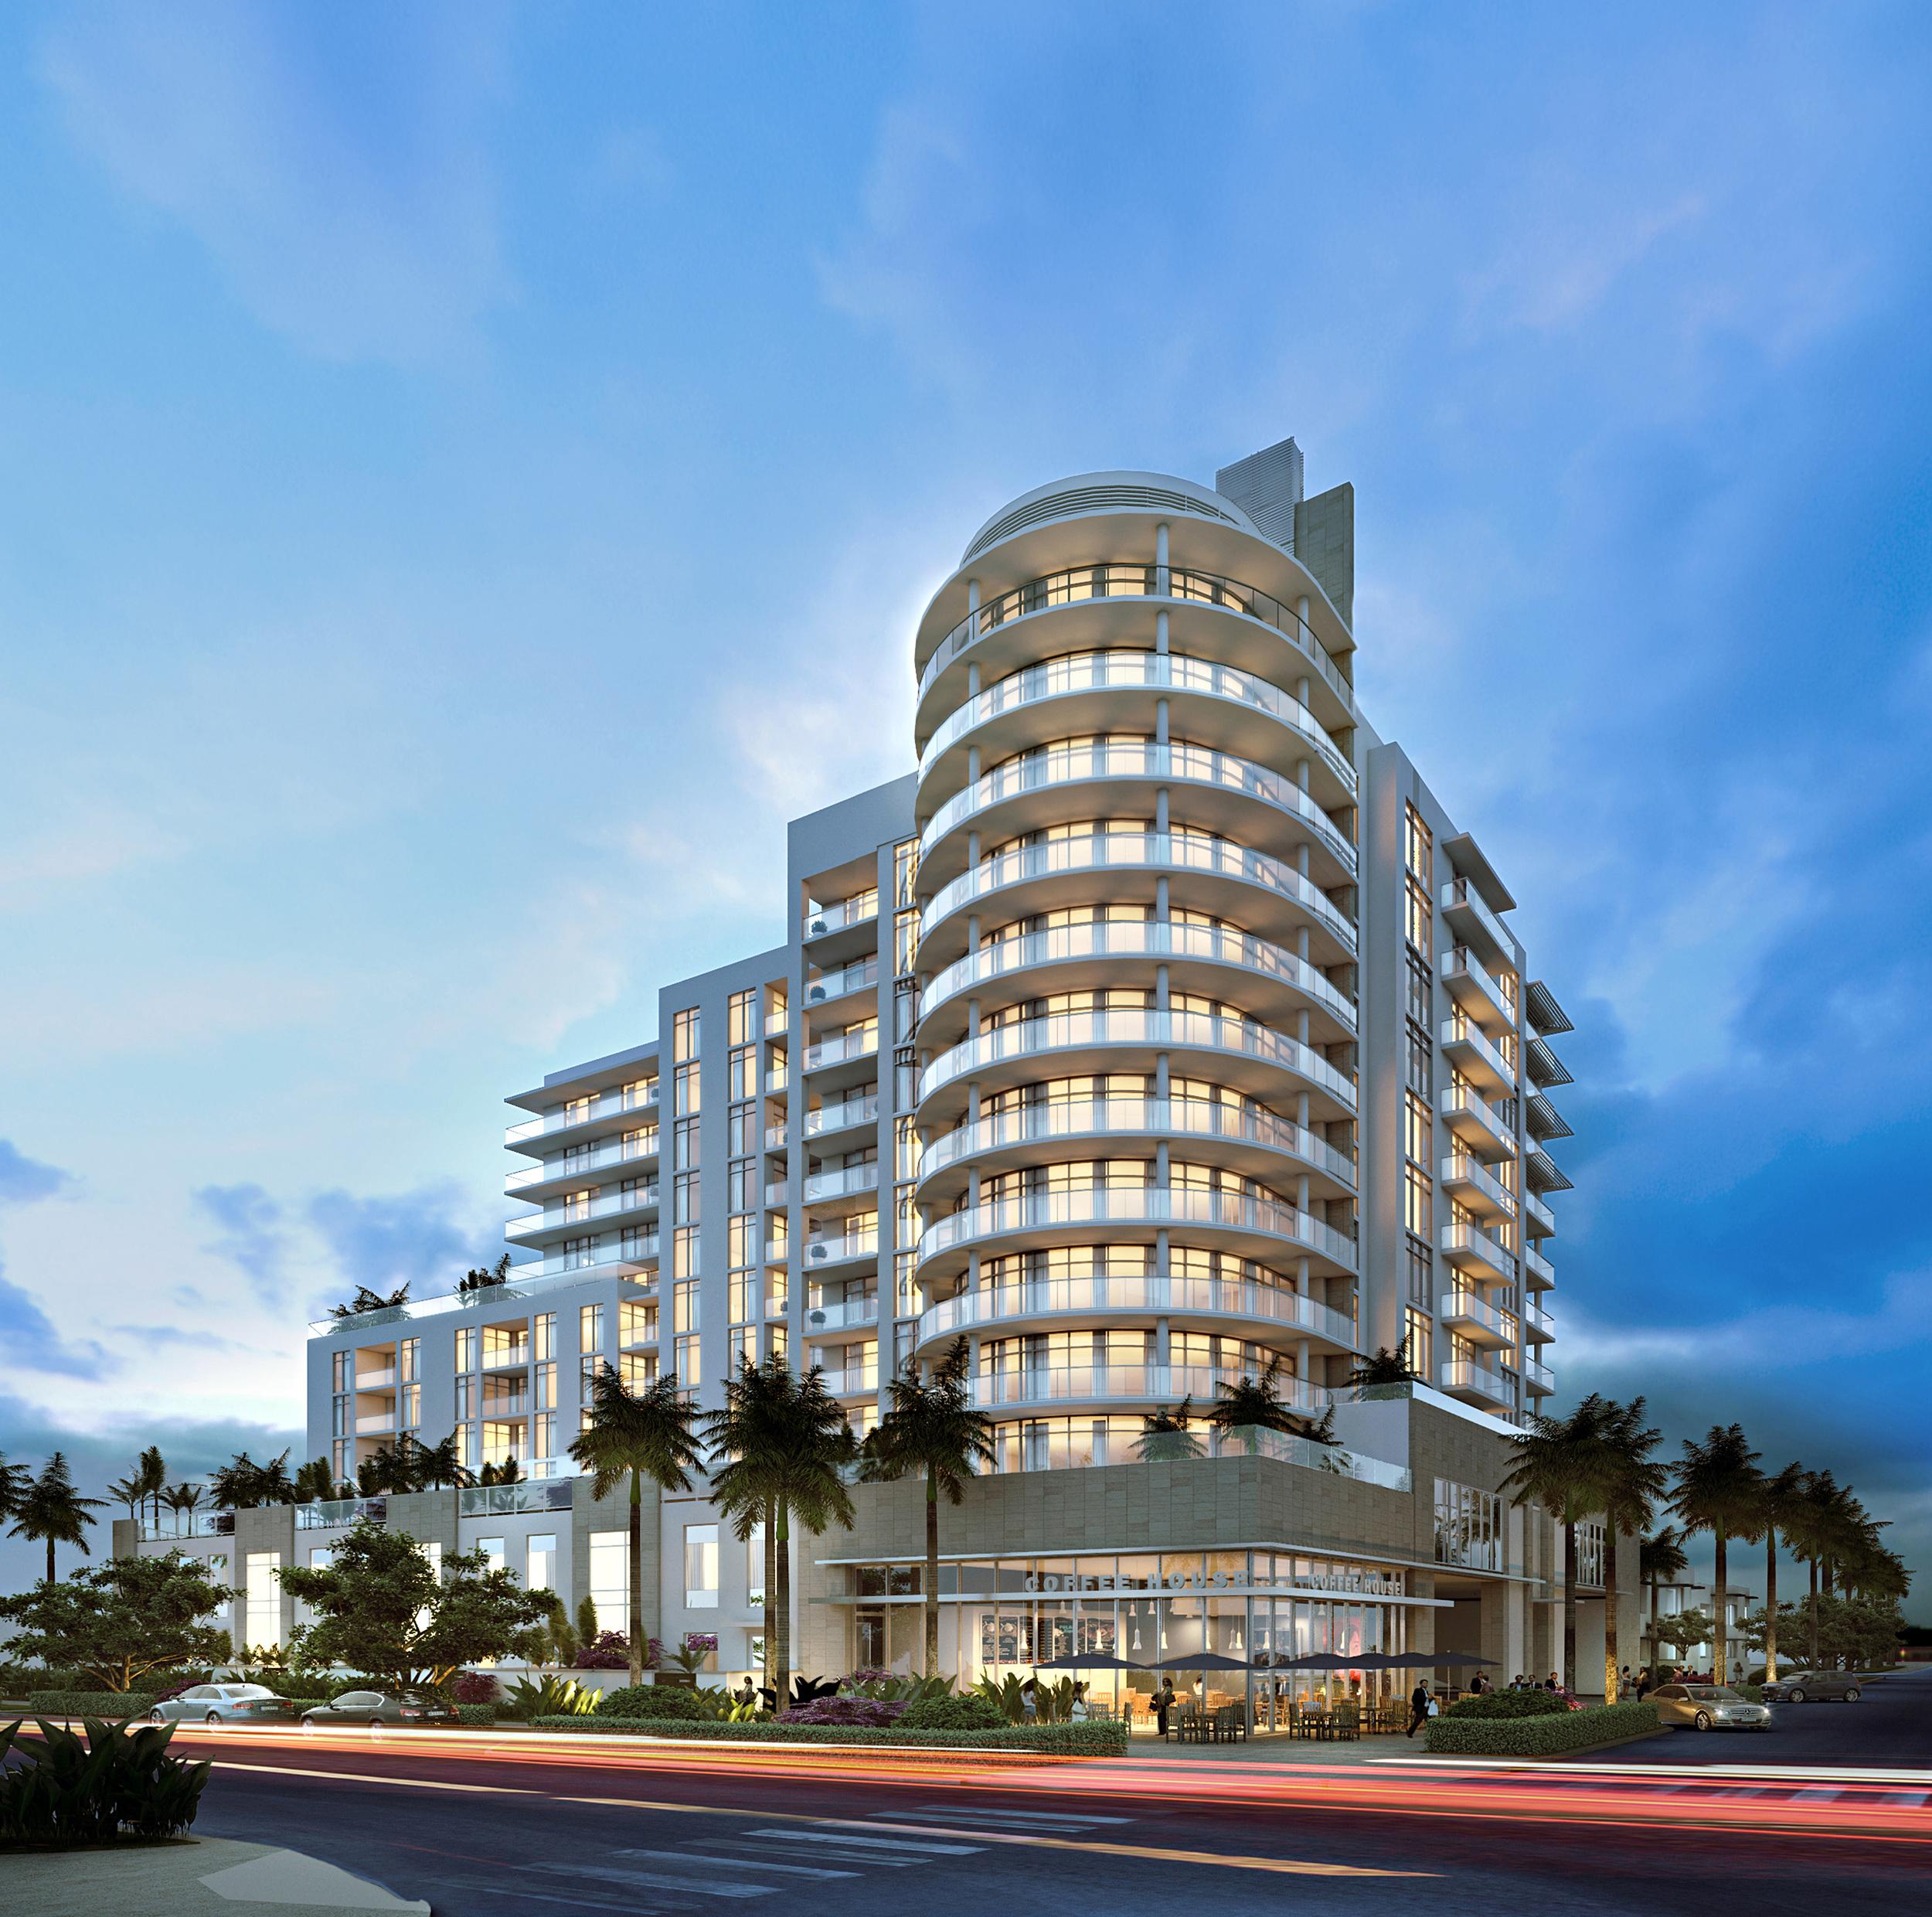 Gale Ft.Lauderdale Residences Building At Dusk